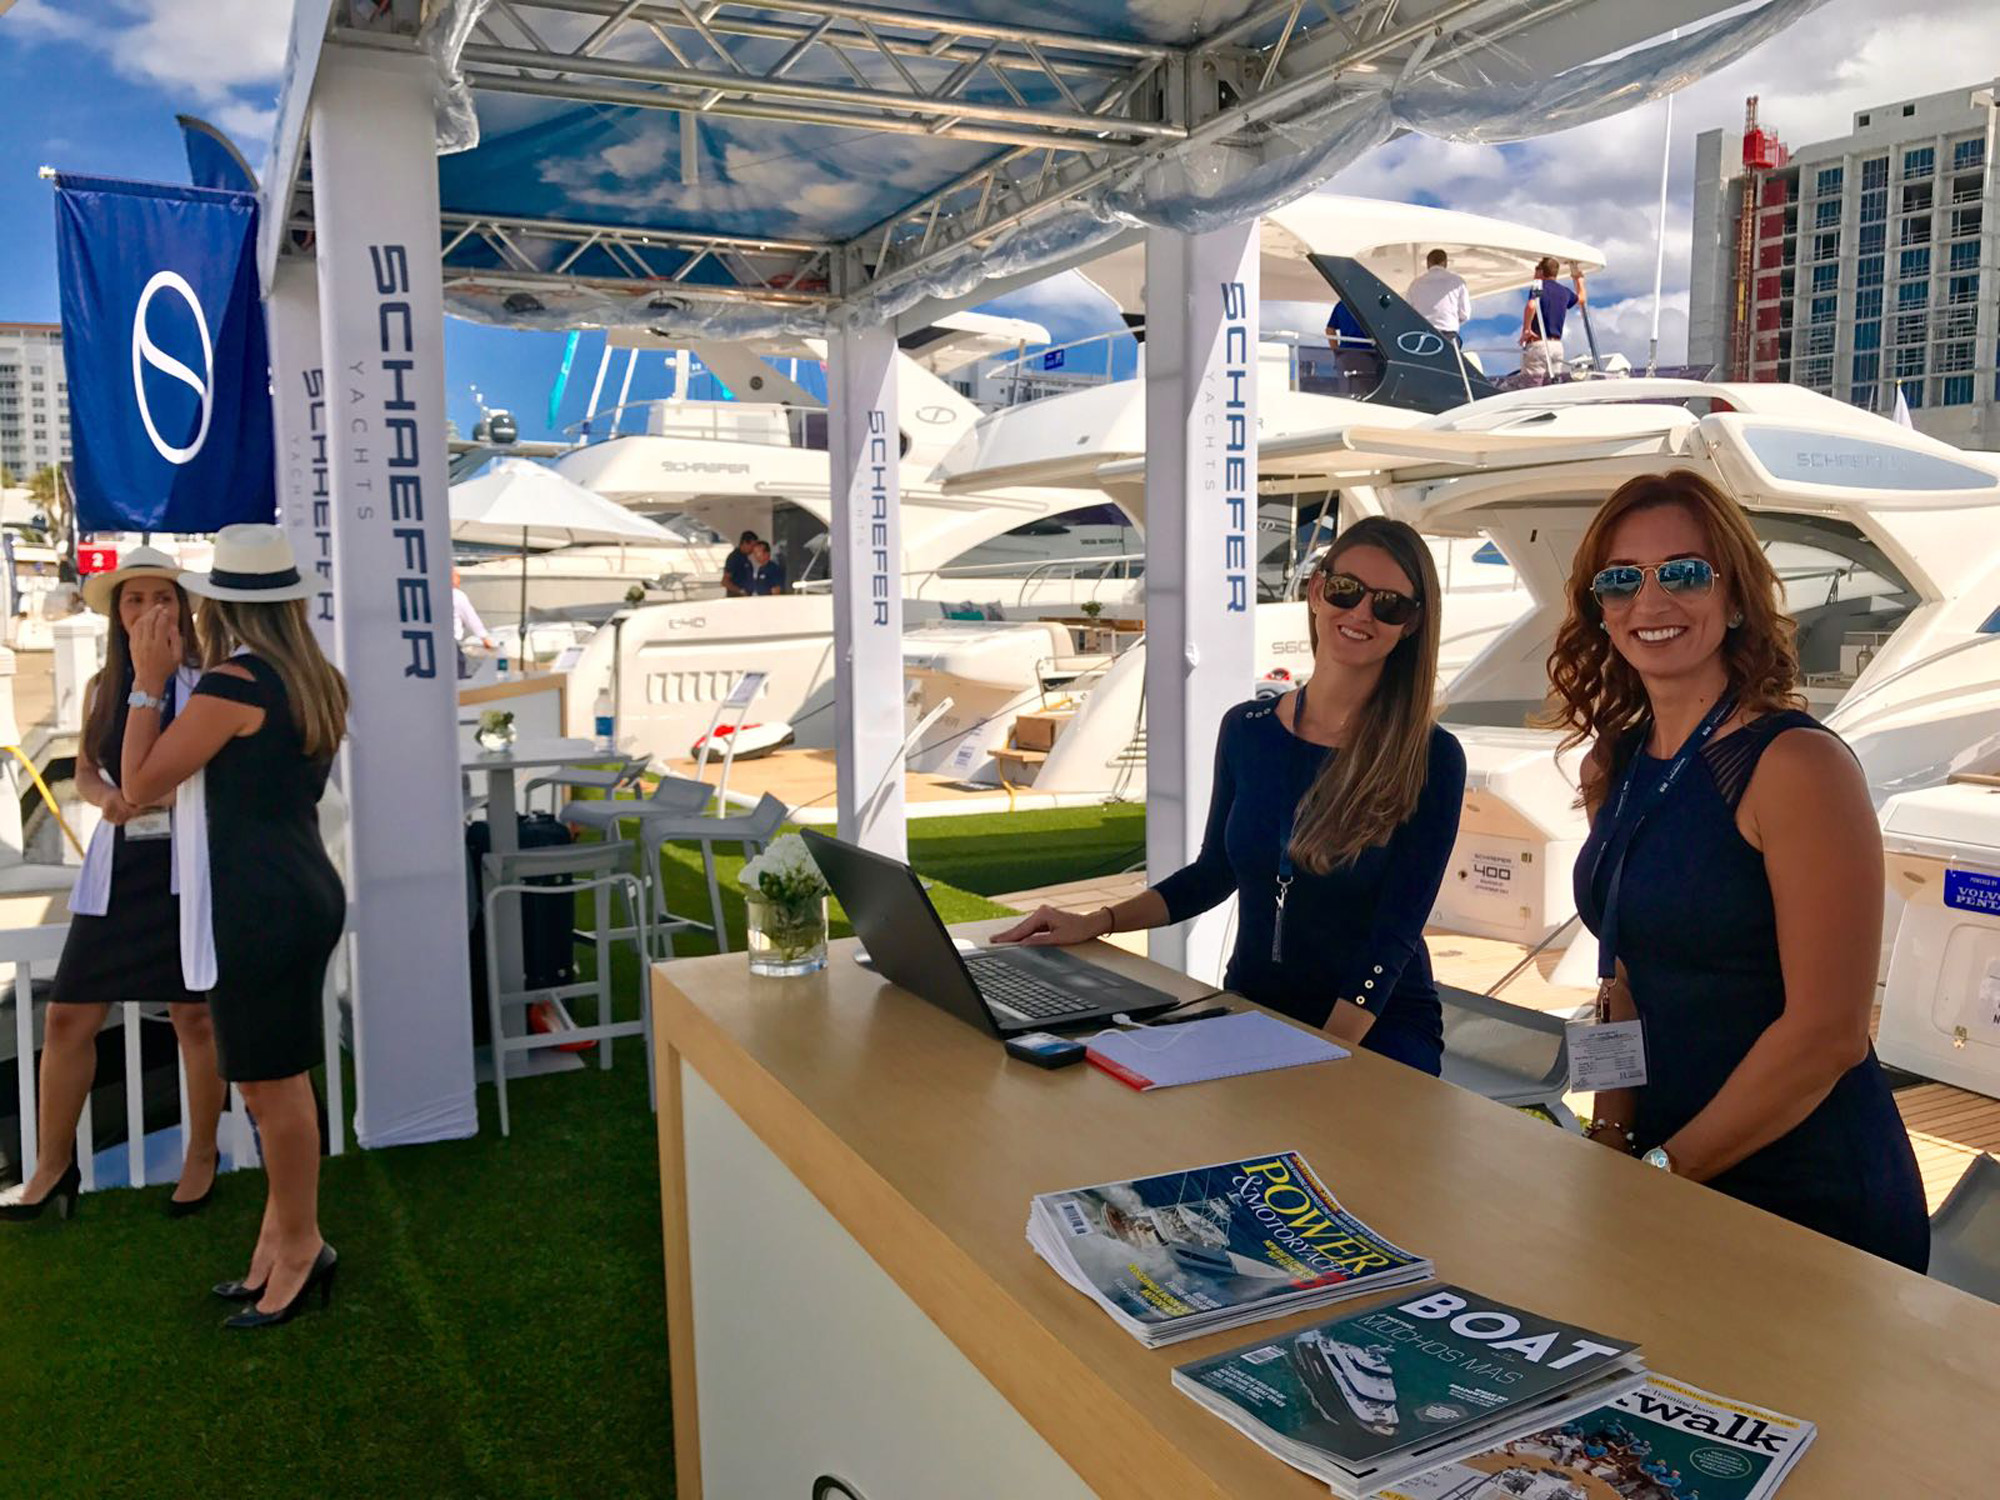 Fort Lauderdale Intl Boat Show 2017